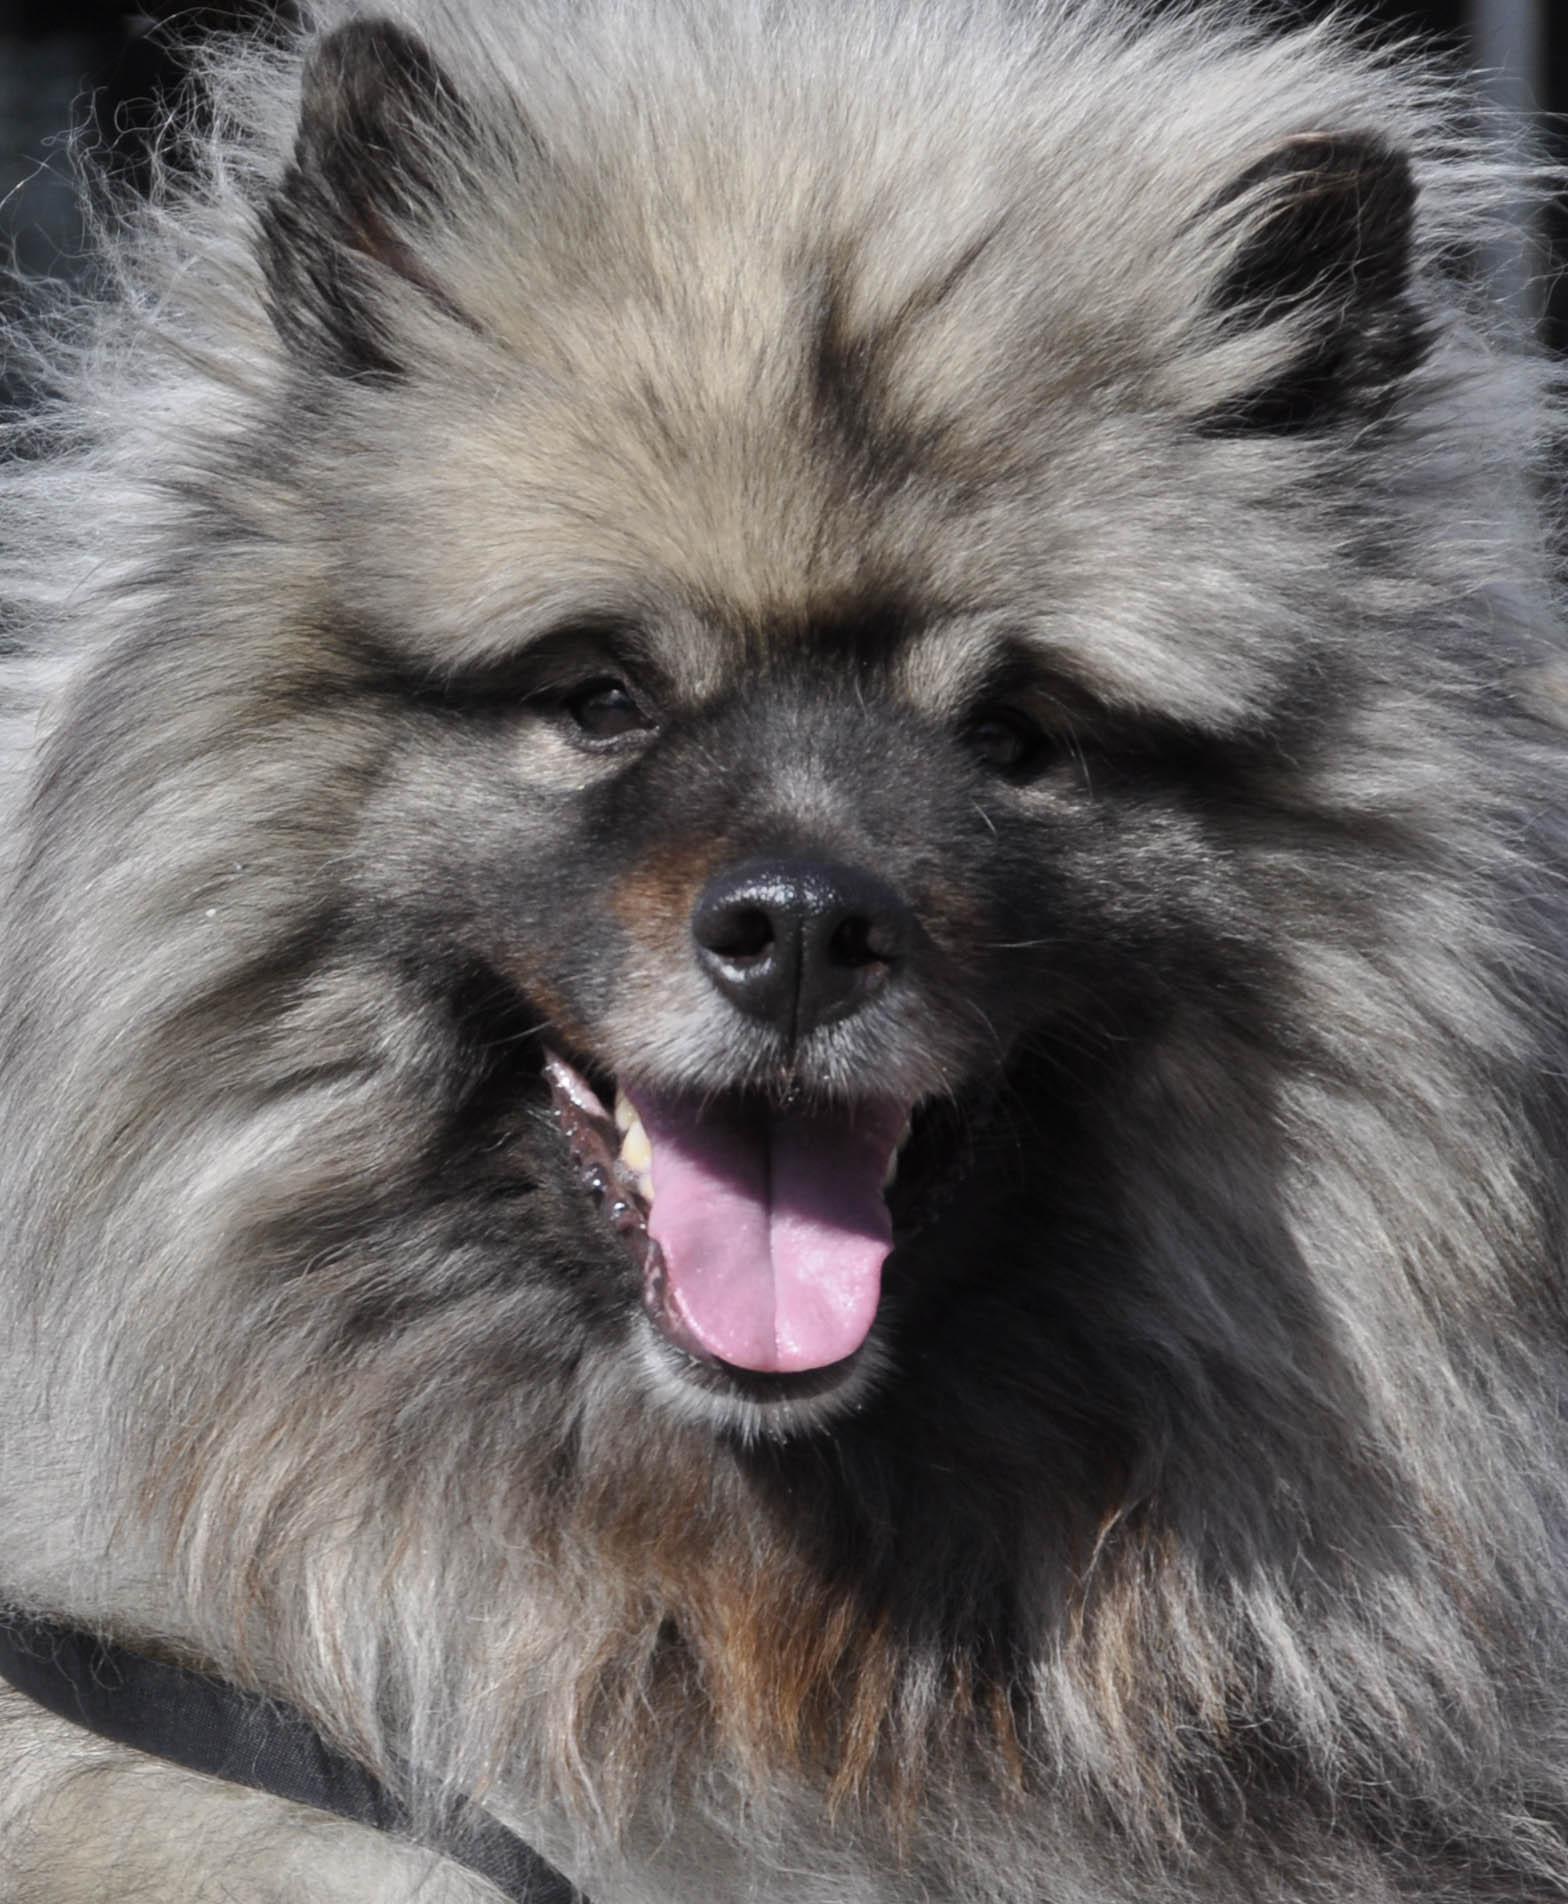 Keeshond dog face wallpaper